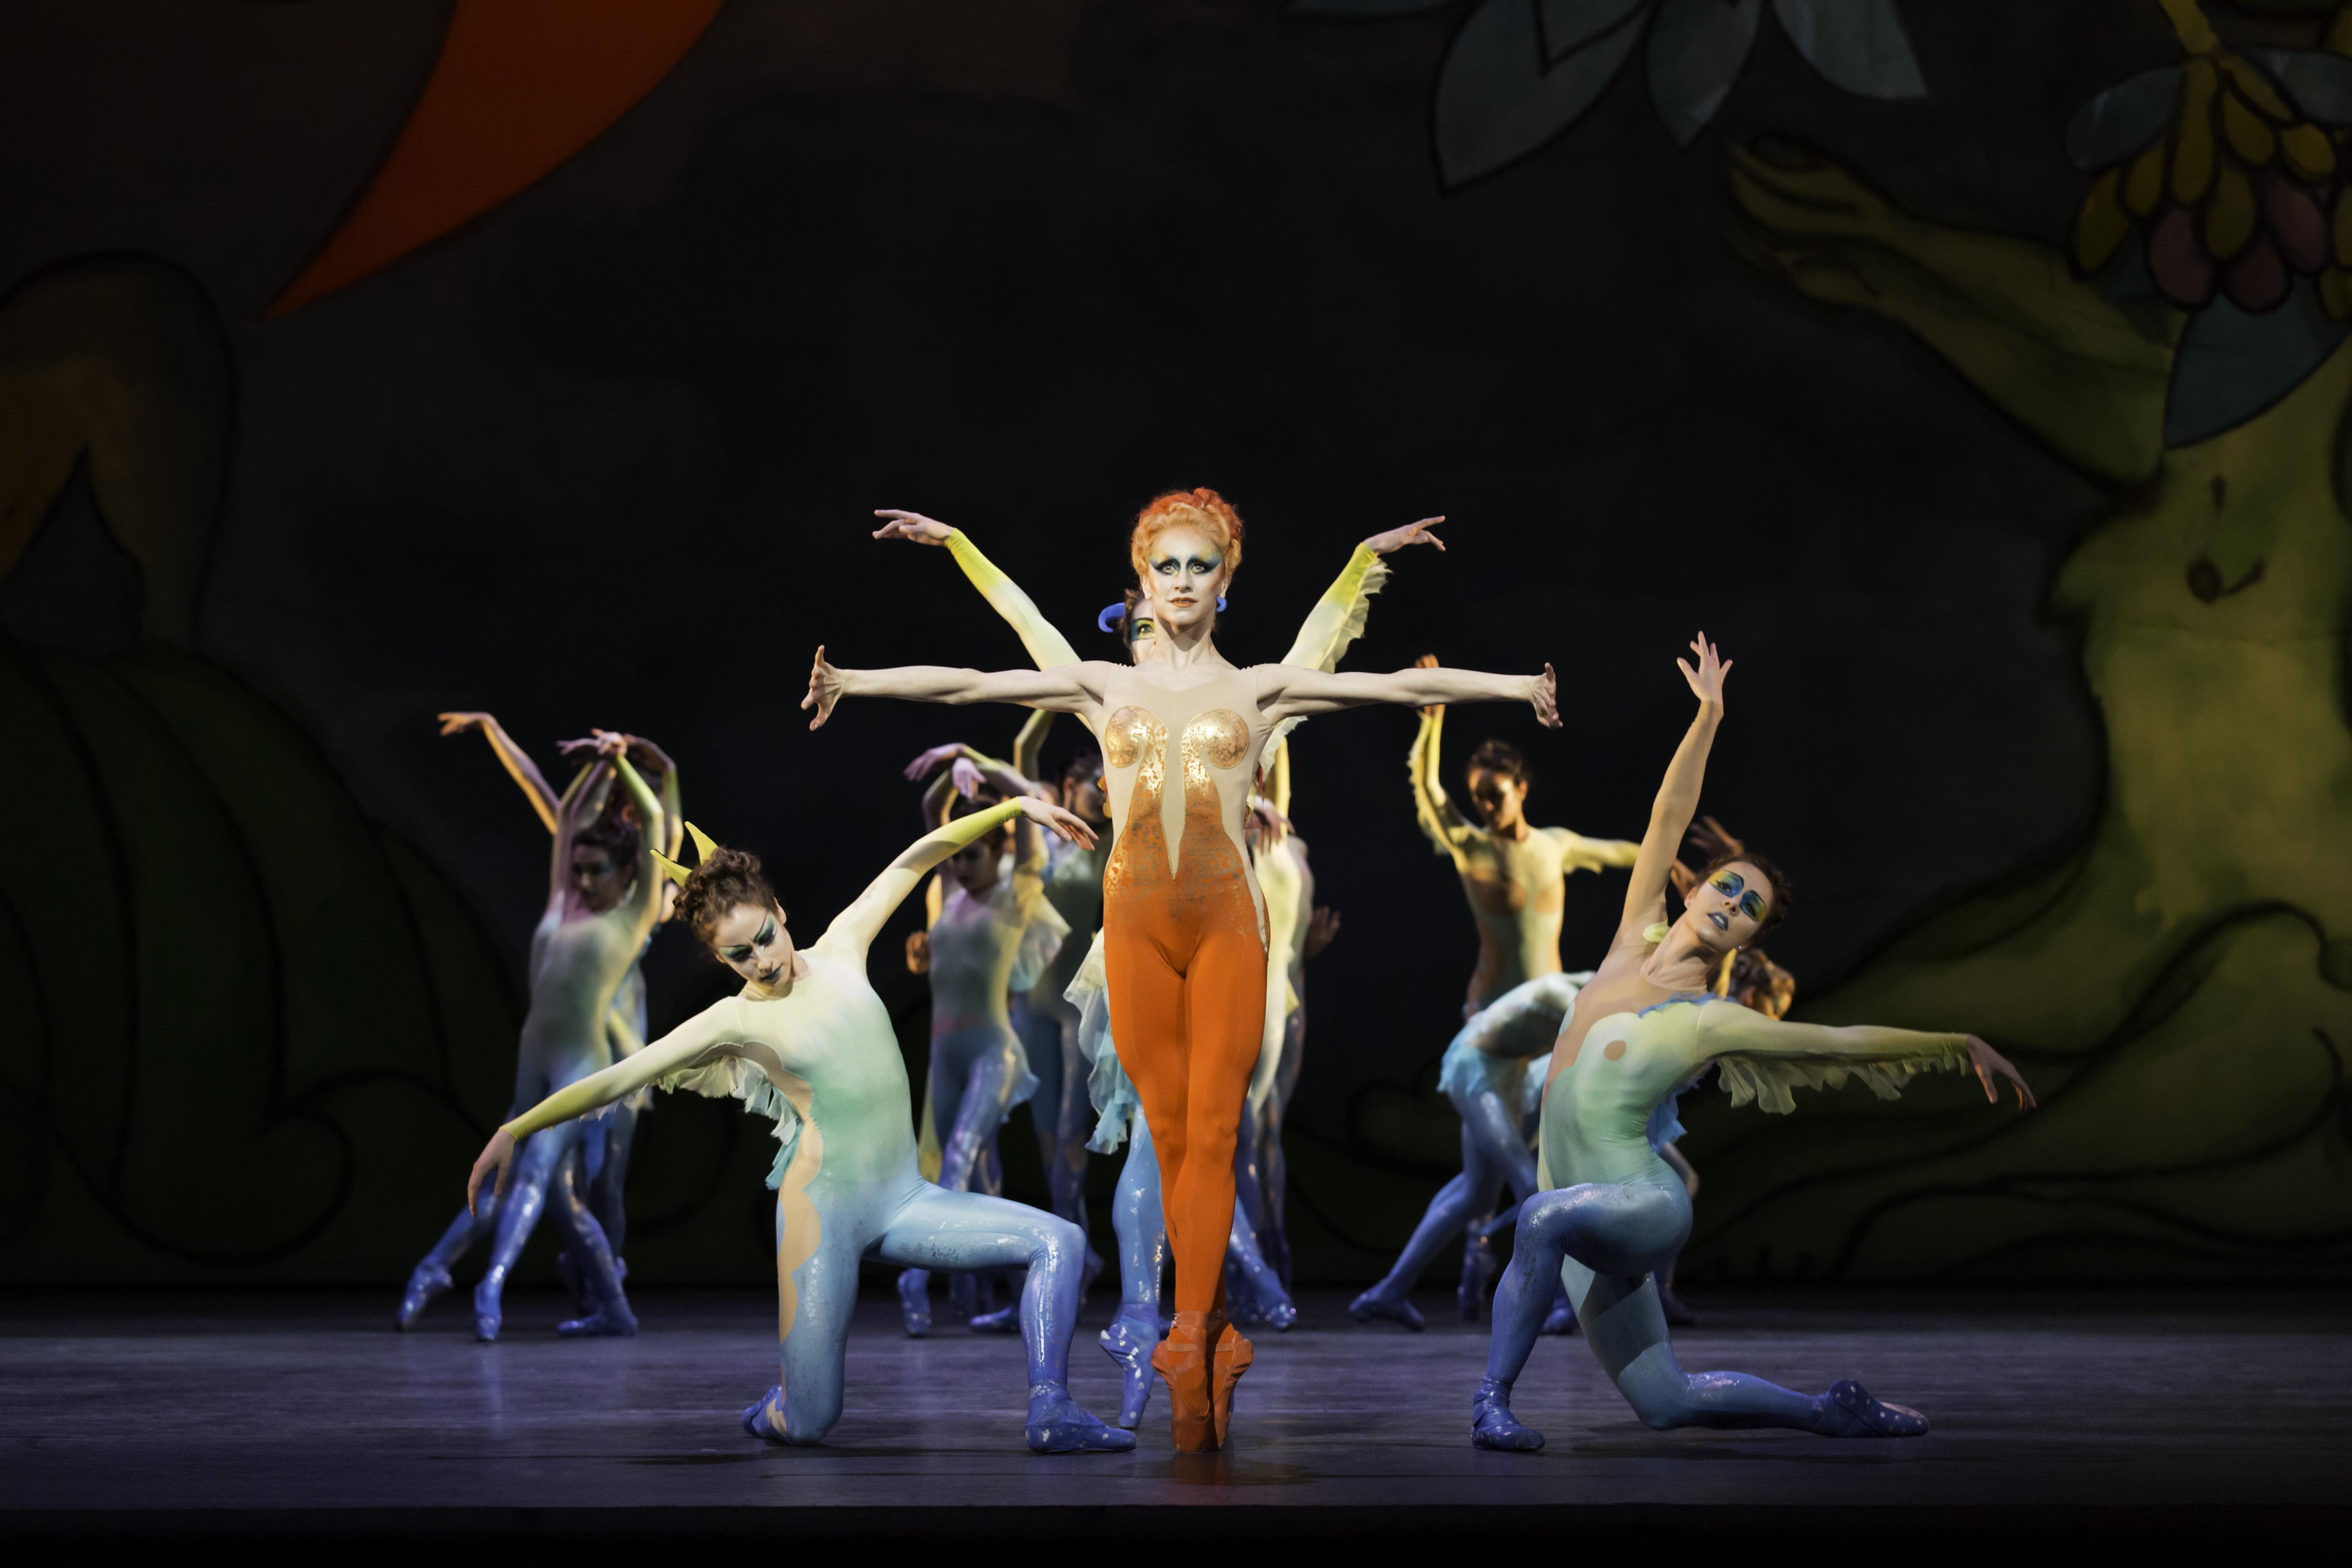 ballet dancer in orange tights